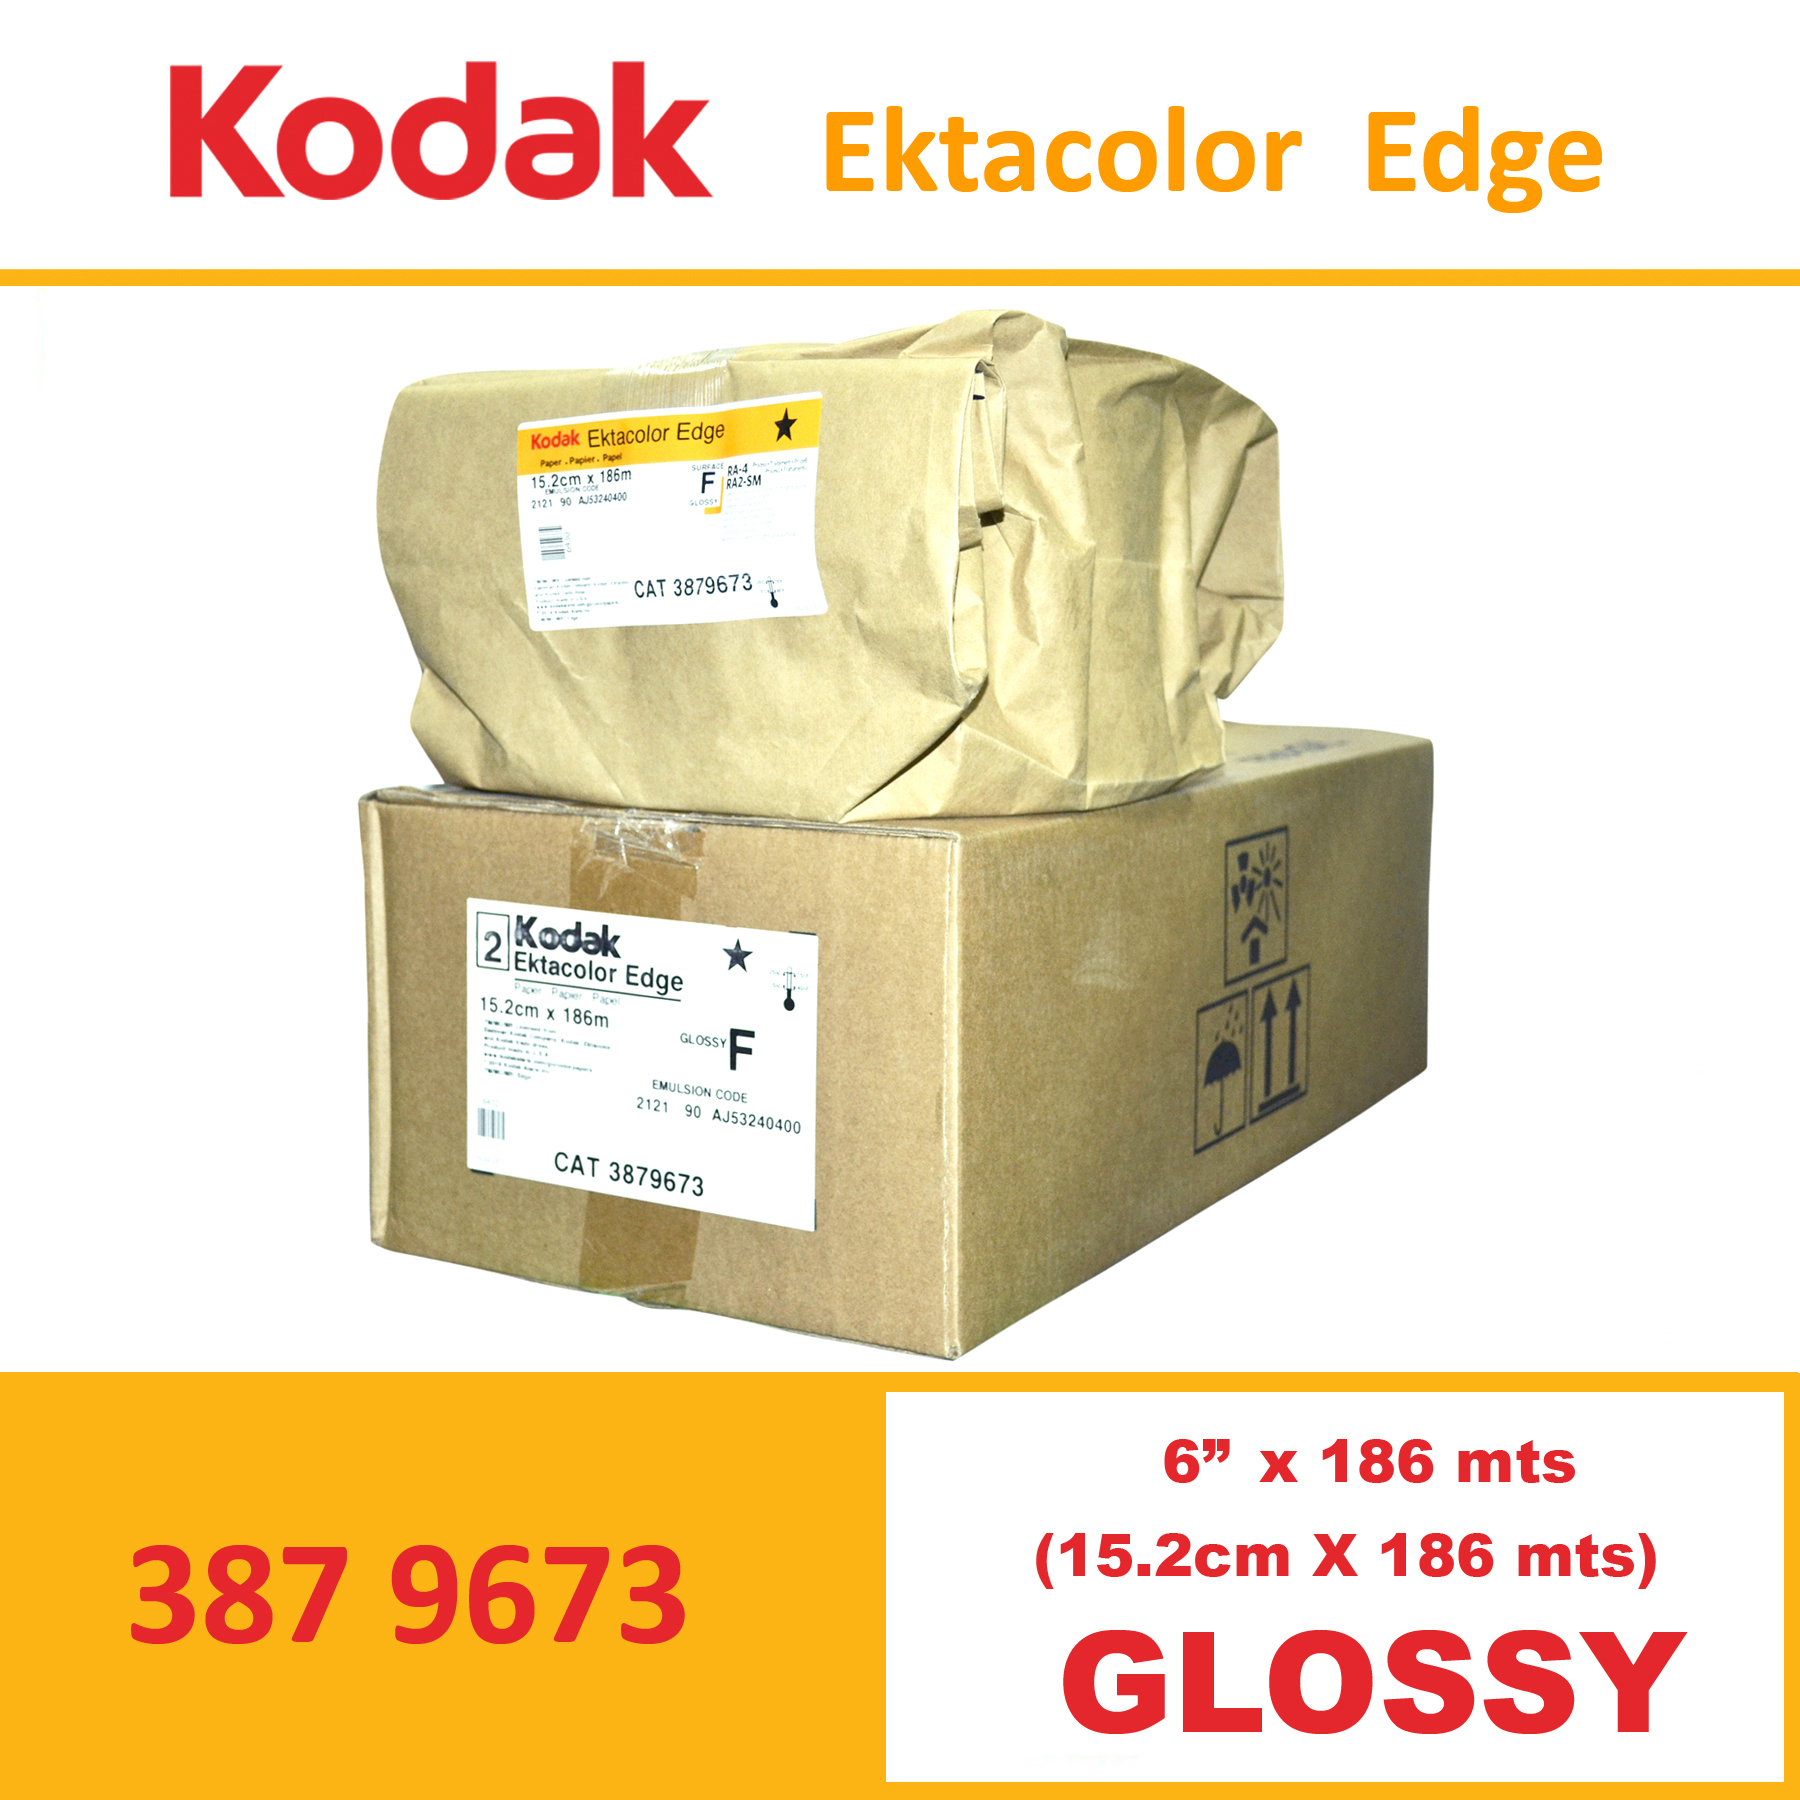 "Kodak 6"" Ekta Color Edge Paper Glossy"